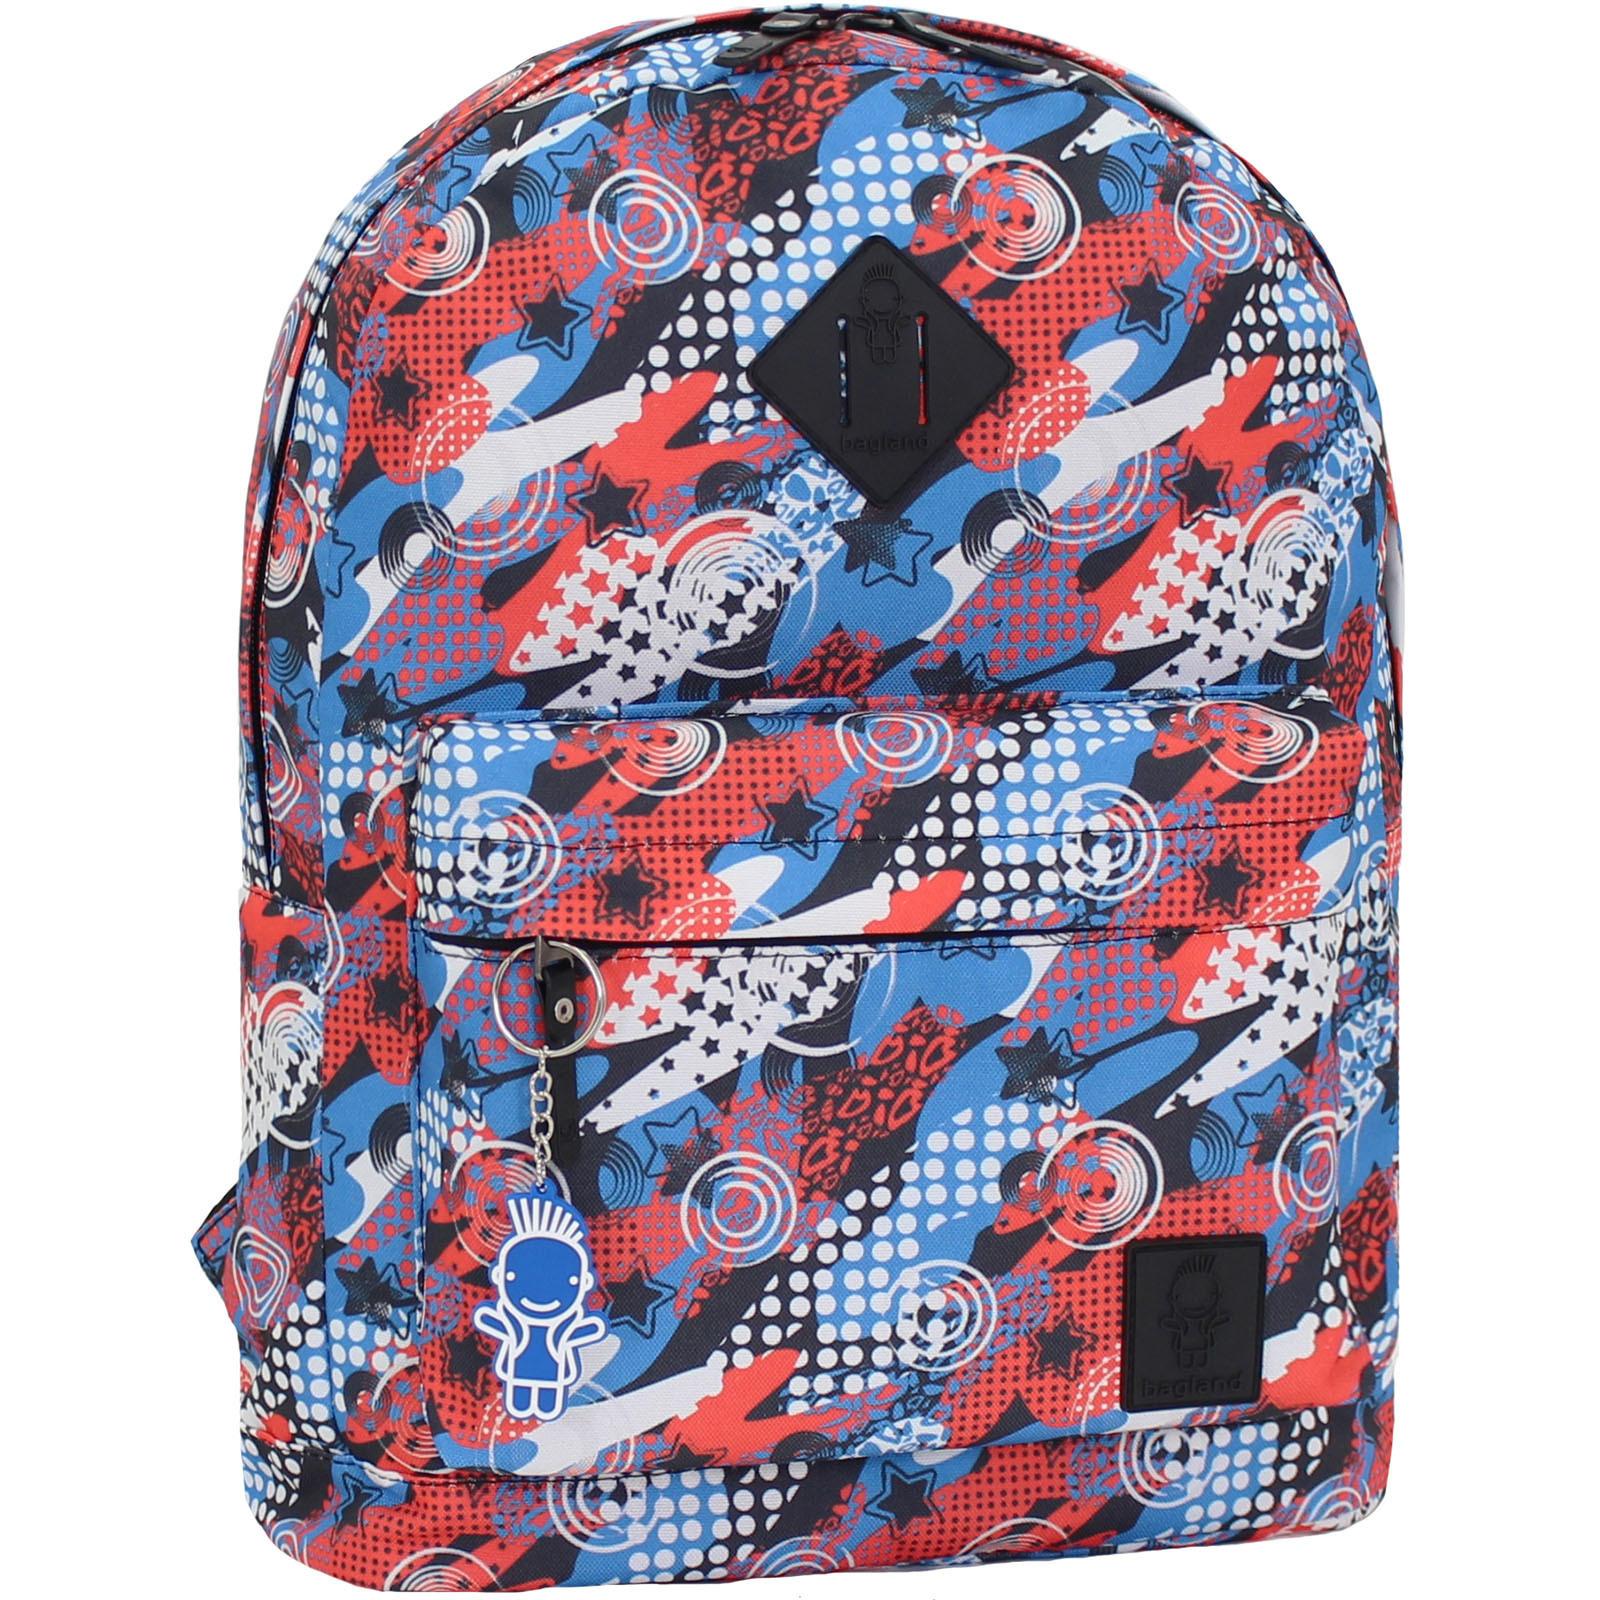 Городские рюкзаки Рюкзак Bagland Молодежный (дизайн) 17 л. сублимация 288 (00533664) IMG_1166_288.JPG